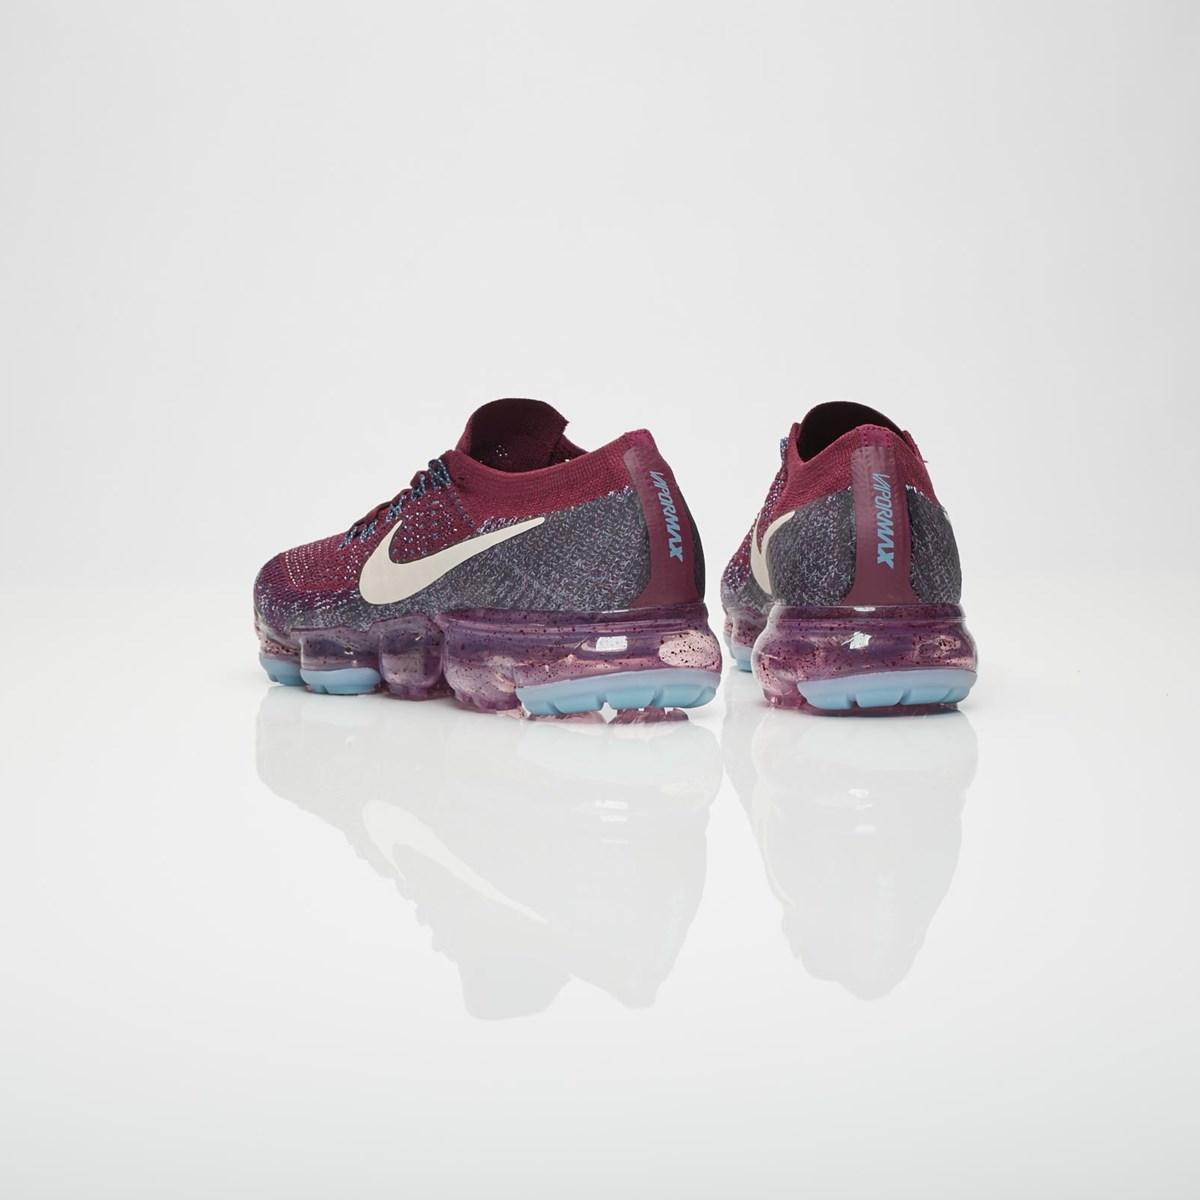 2c63afb6082d Nike Wmns Air Vapormax Flyknit - 899472-602 - Sneakersnstuff ...